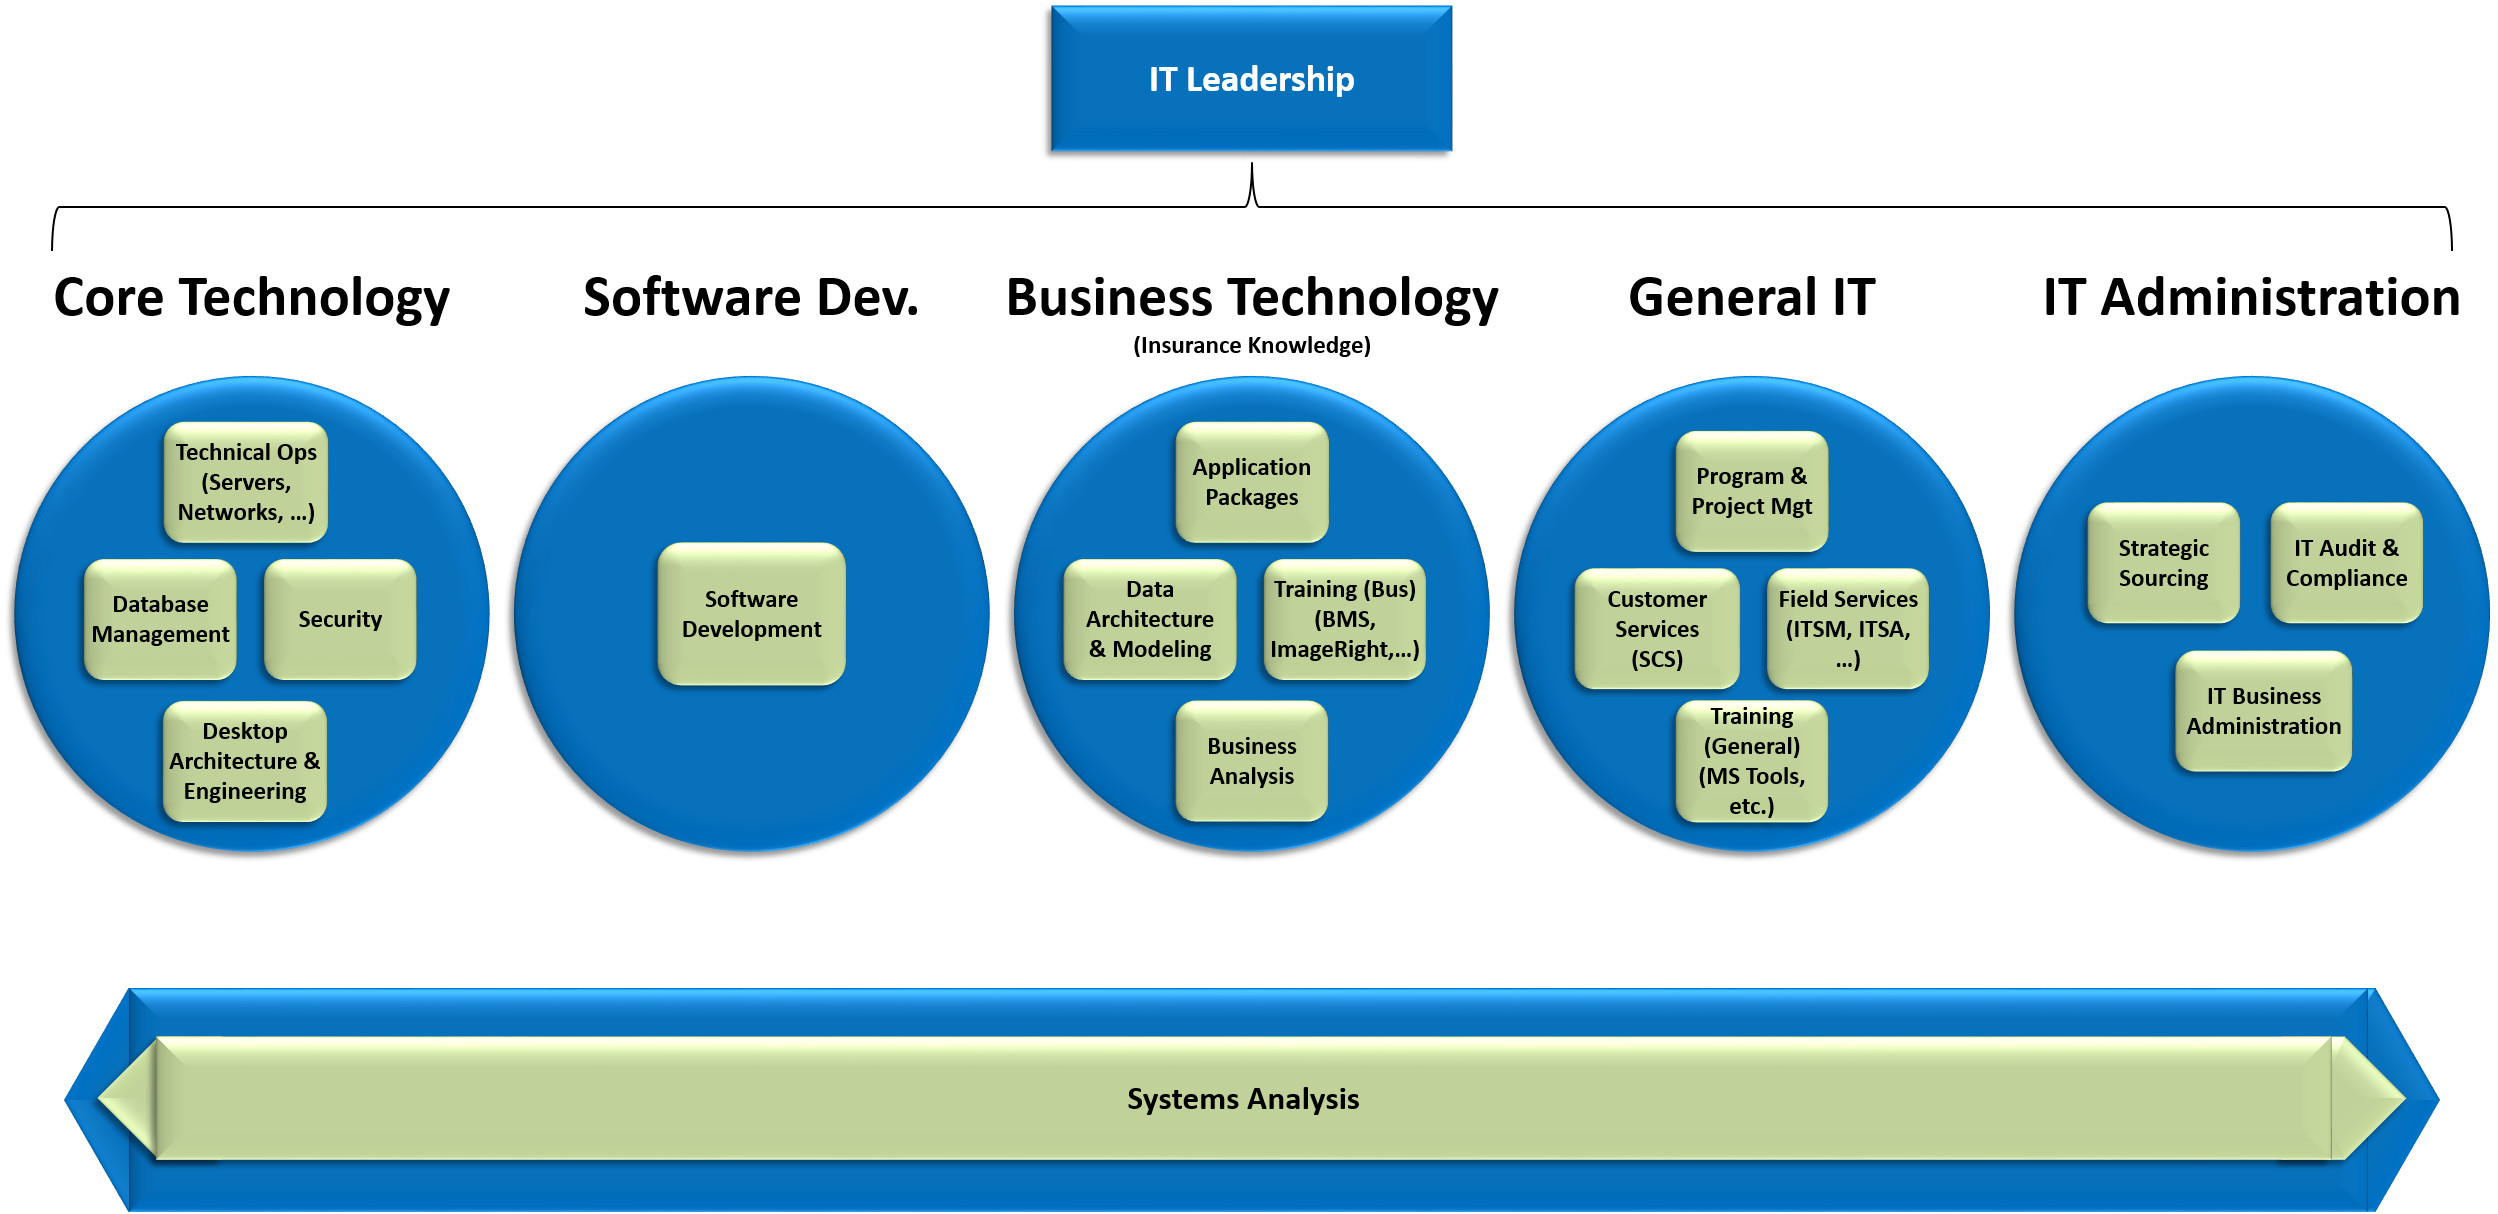 IT career paths